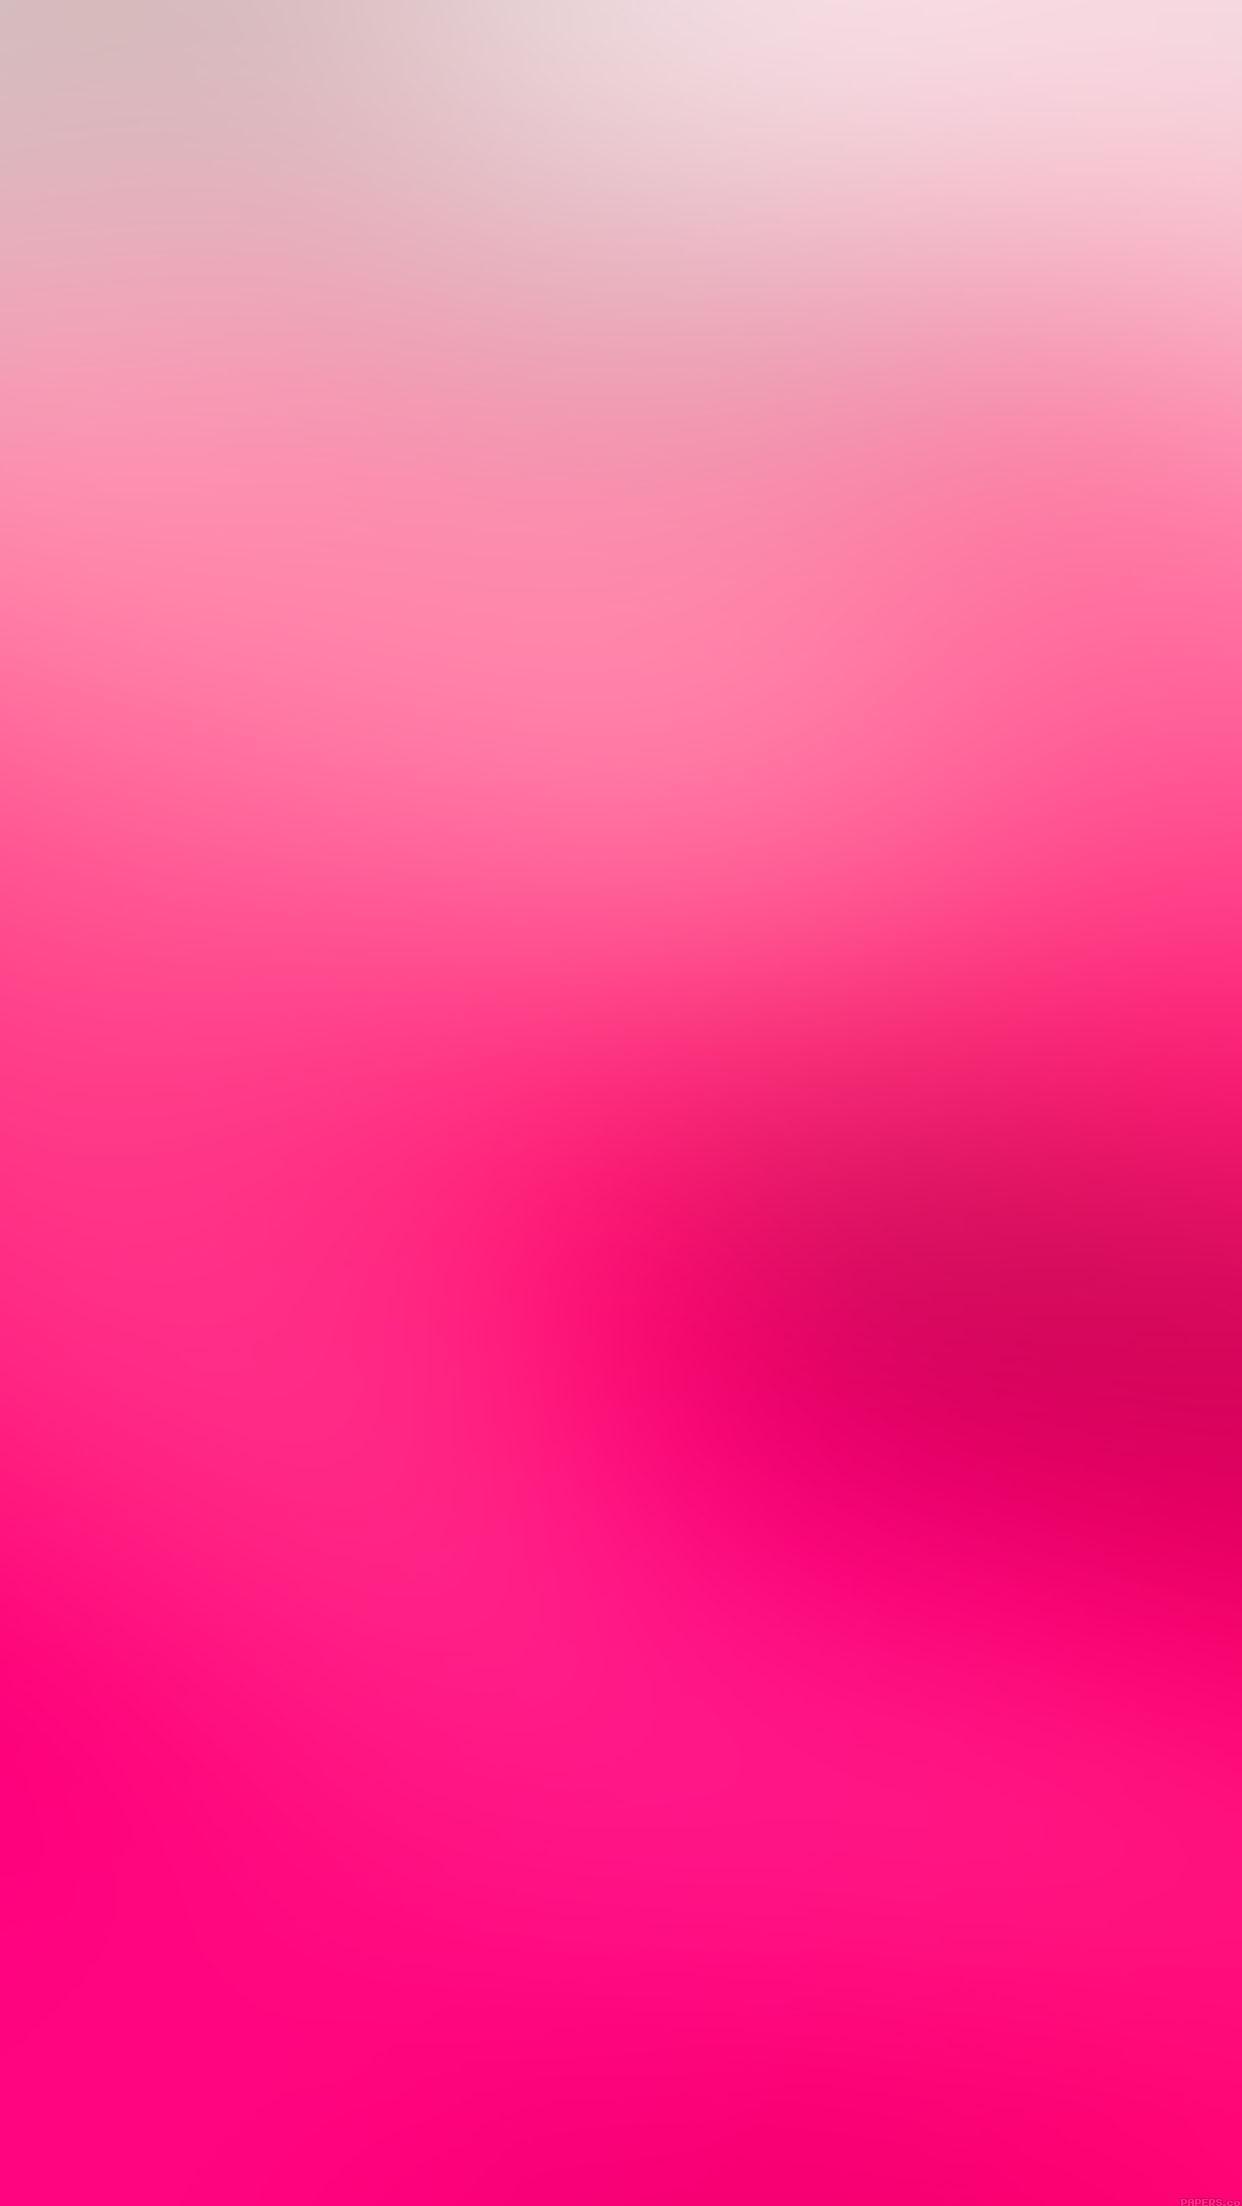 Pink Gradient Background Iphone Wallpaper Iphone Wallpapers